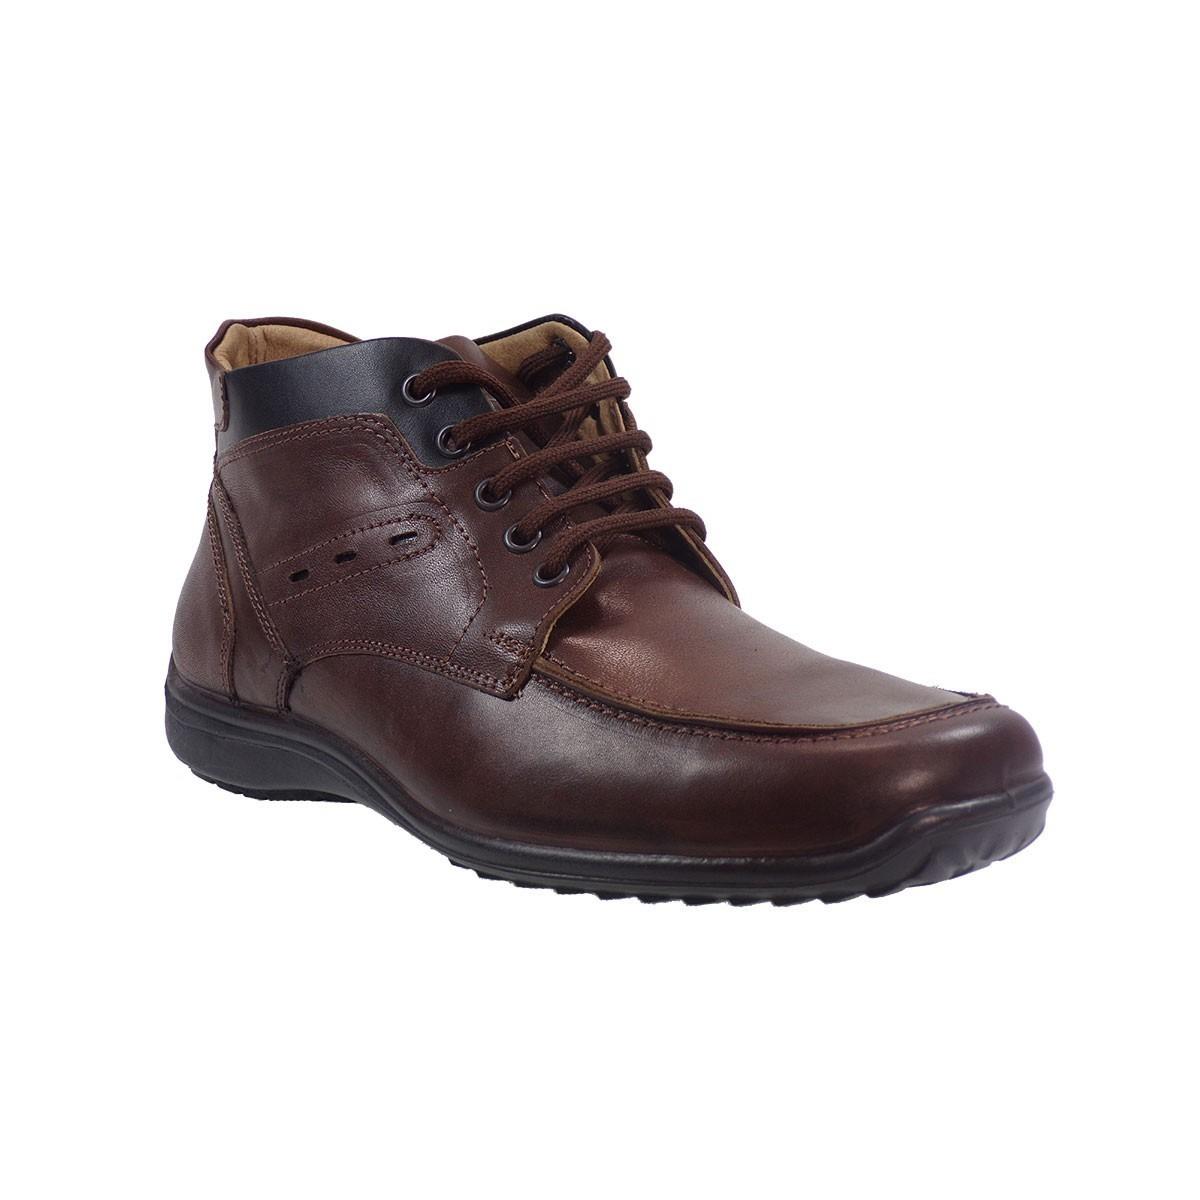 5756beac797a Aeropelma Duetto Ανδρικά Παπούτσια Μποτάκια 606 Καφέ Δέρμα ...